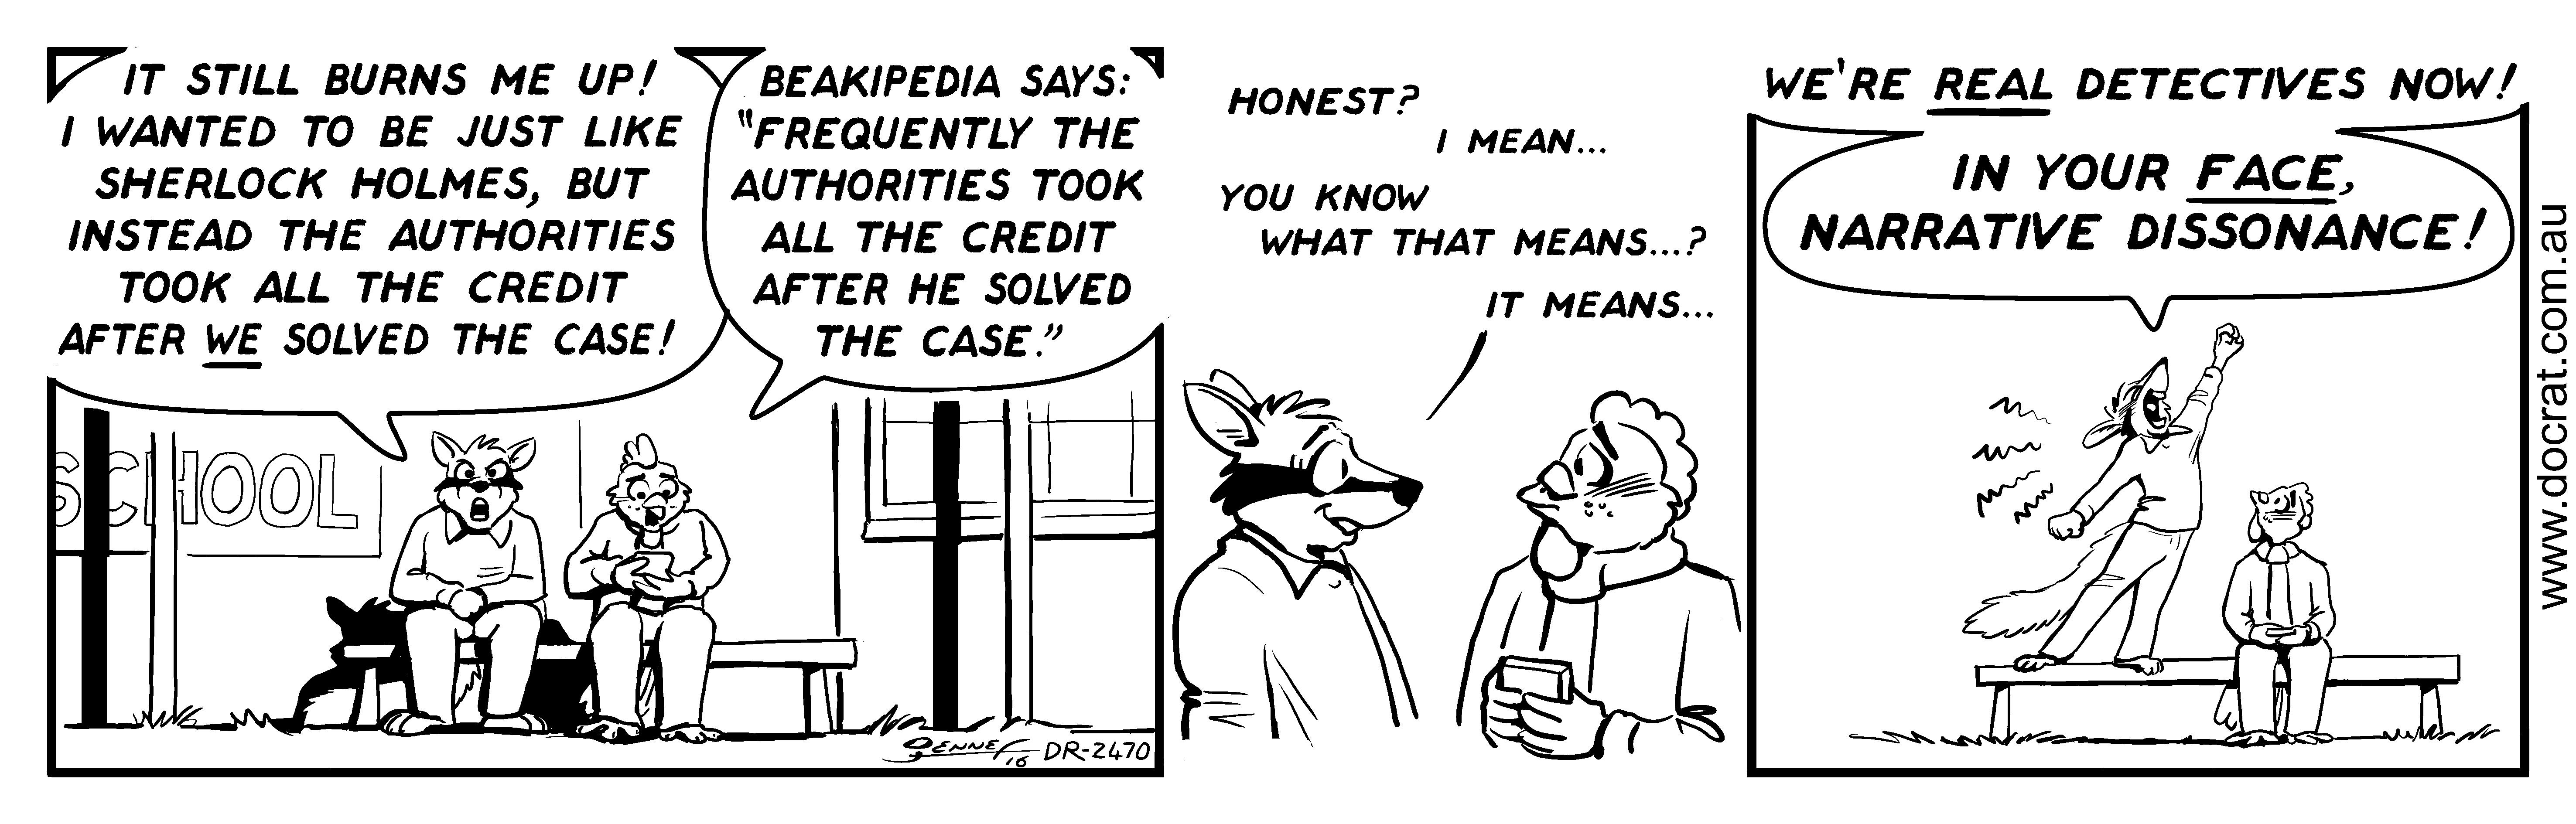 20160226